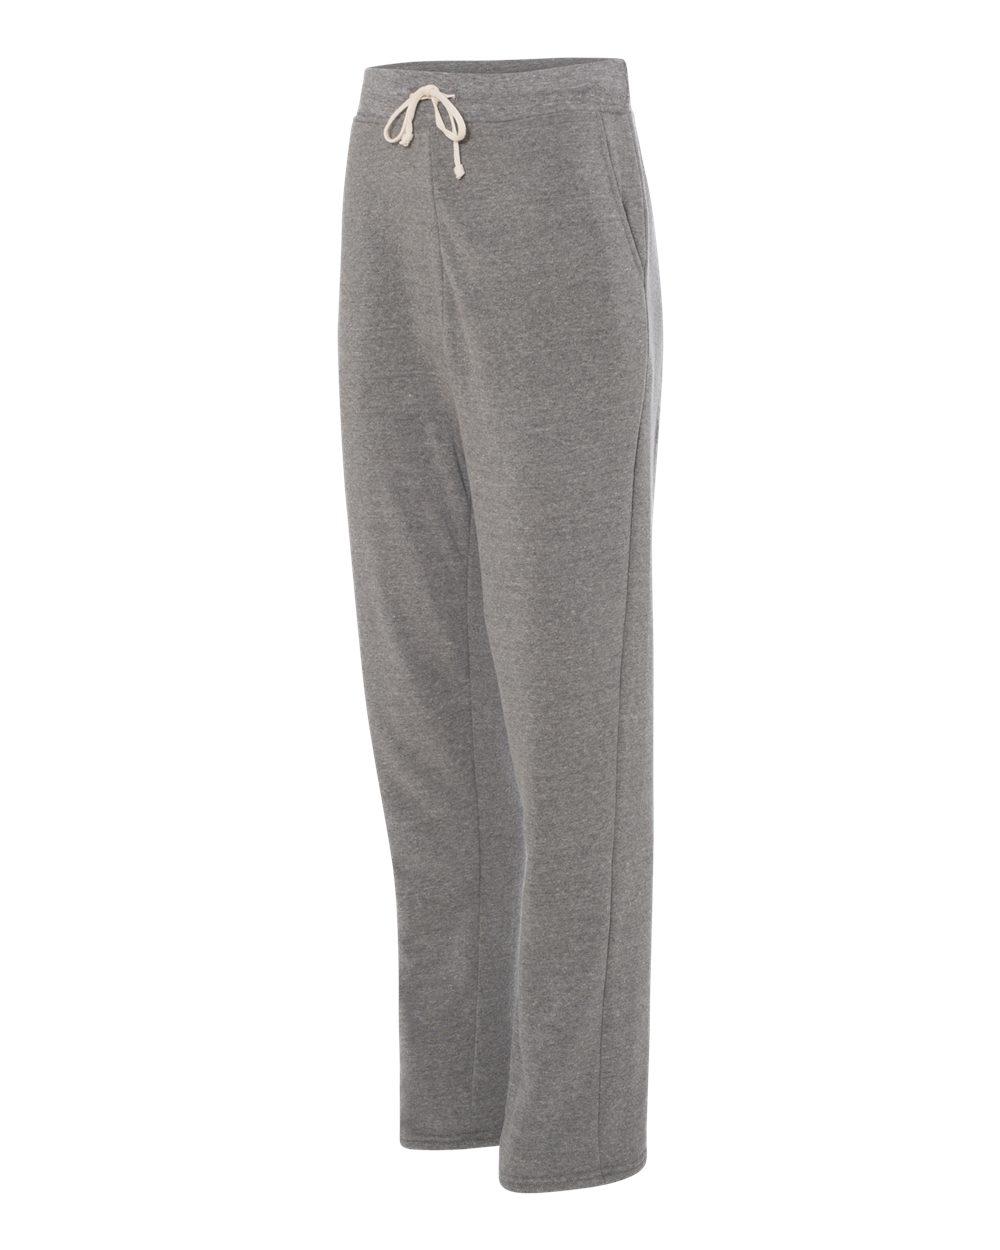 Alternative 3500 - Eco Fleece Open Bottom Hustle Sweatpants